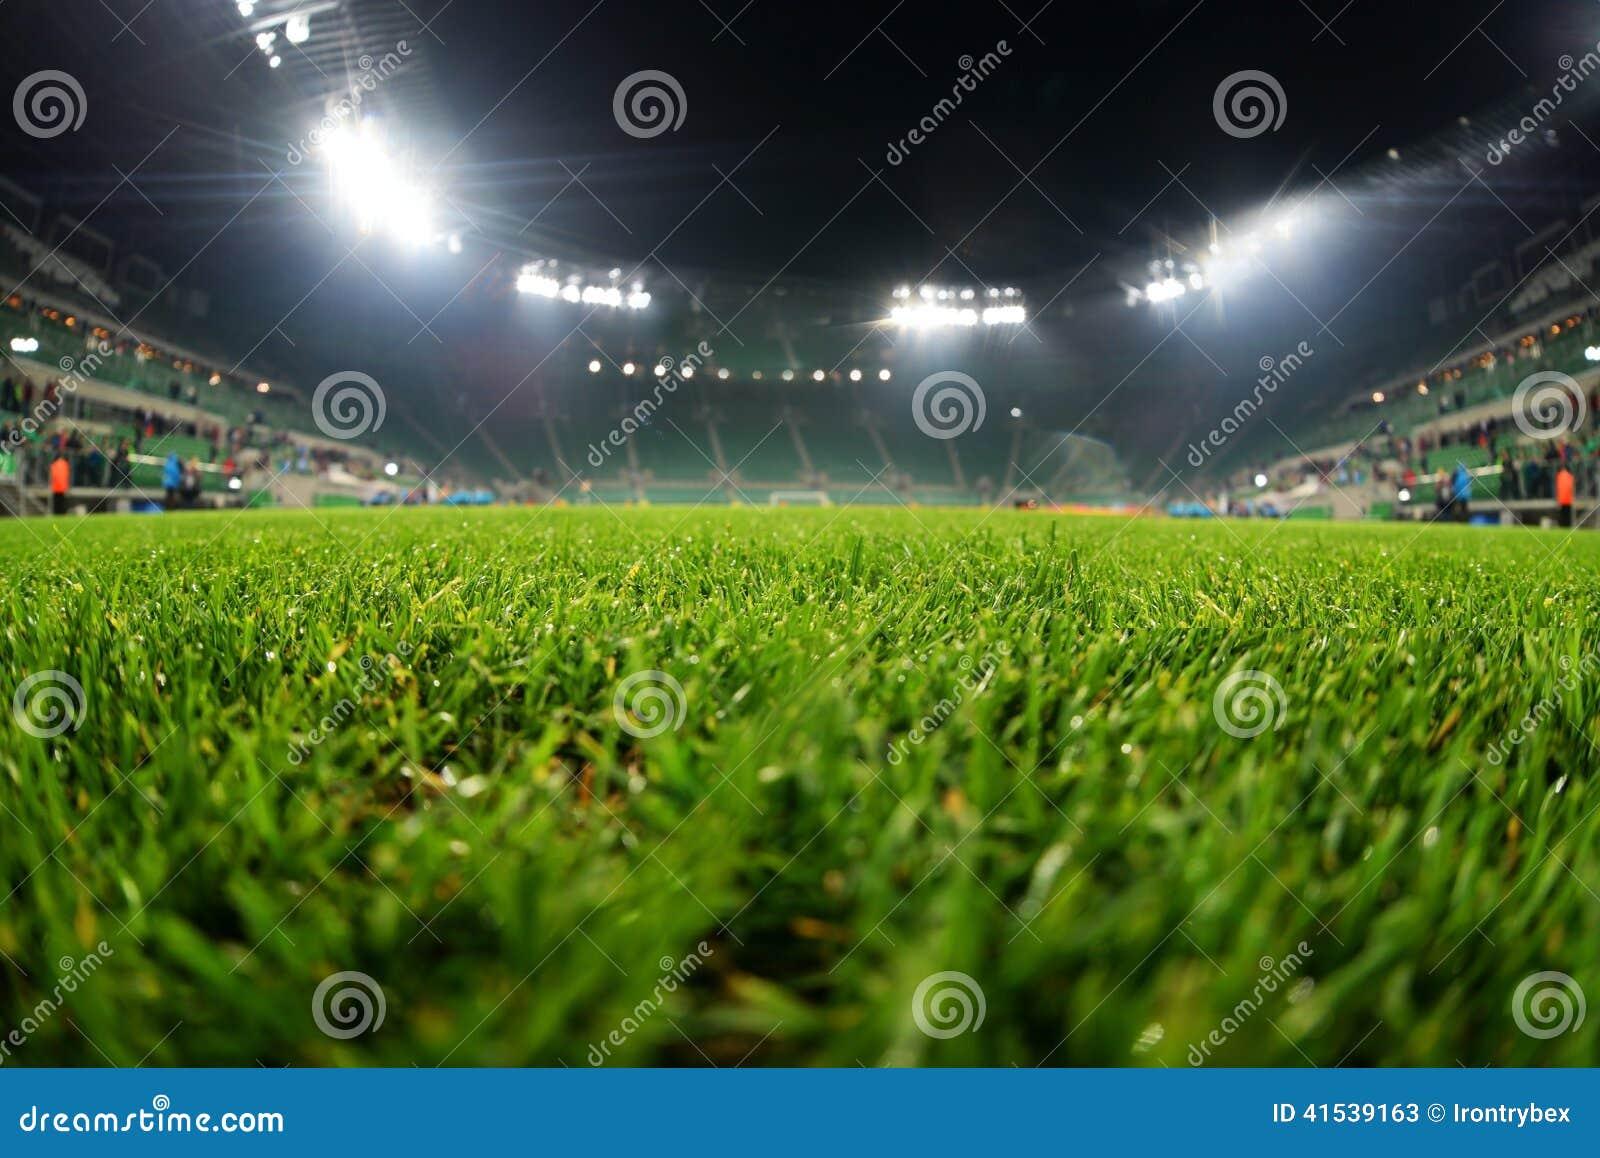 stadium  close up on grass stock photo